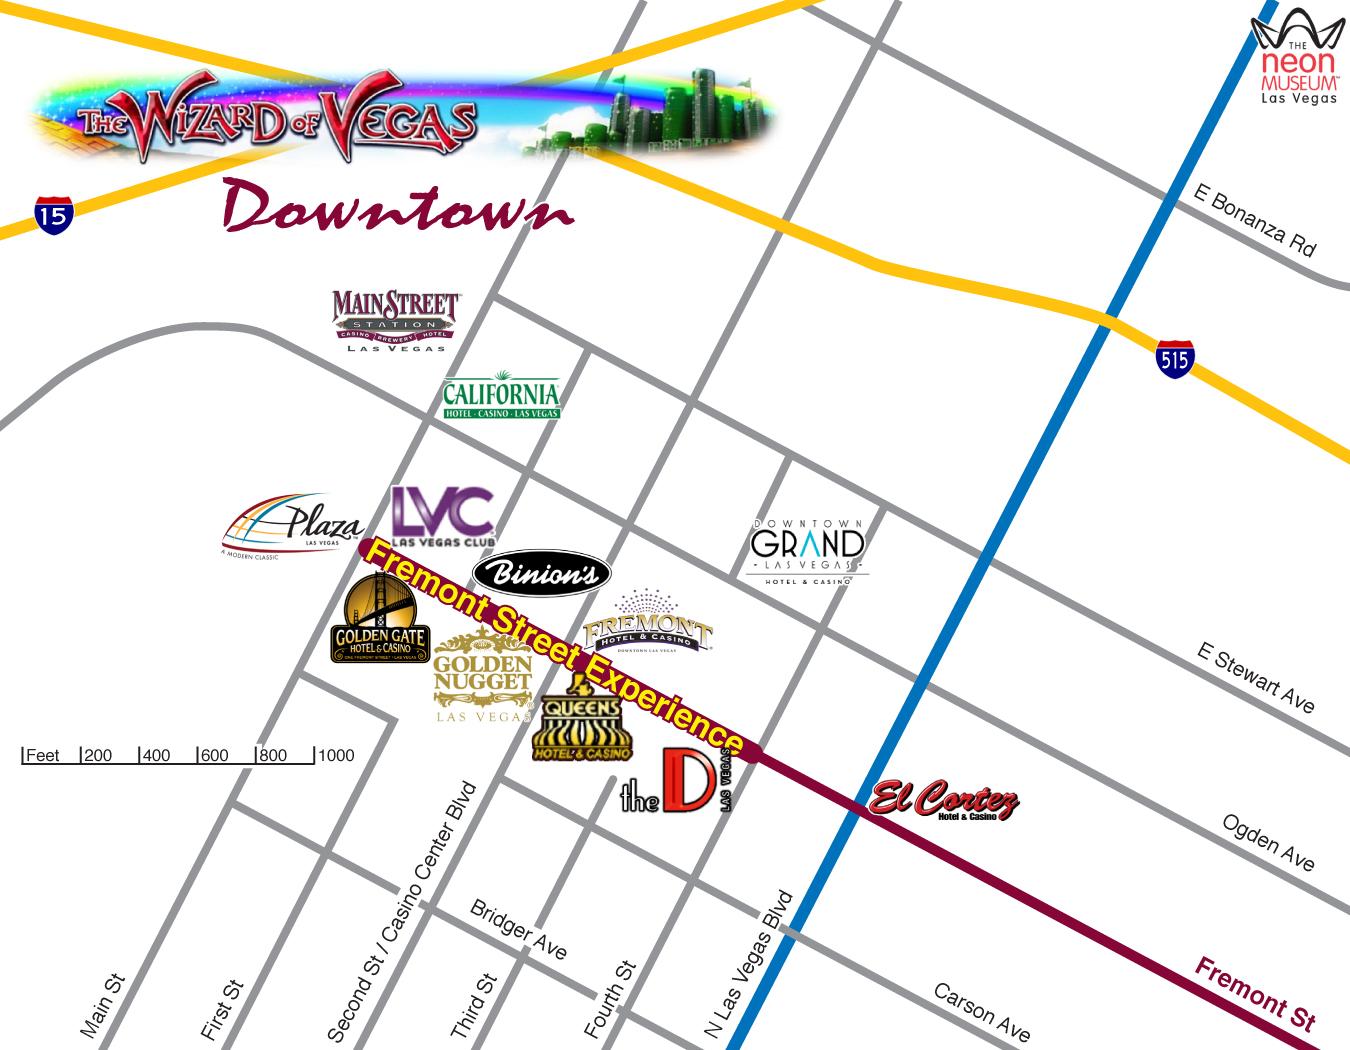 Las Vegas Maps  Wizard of Vegas